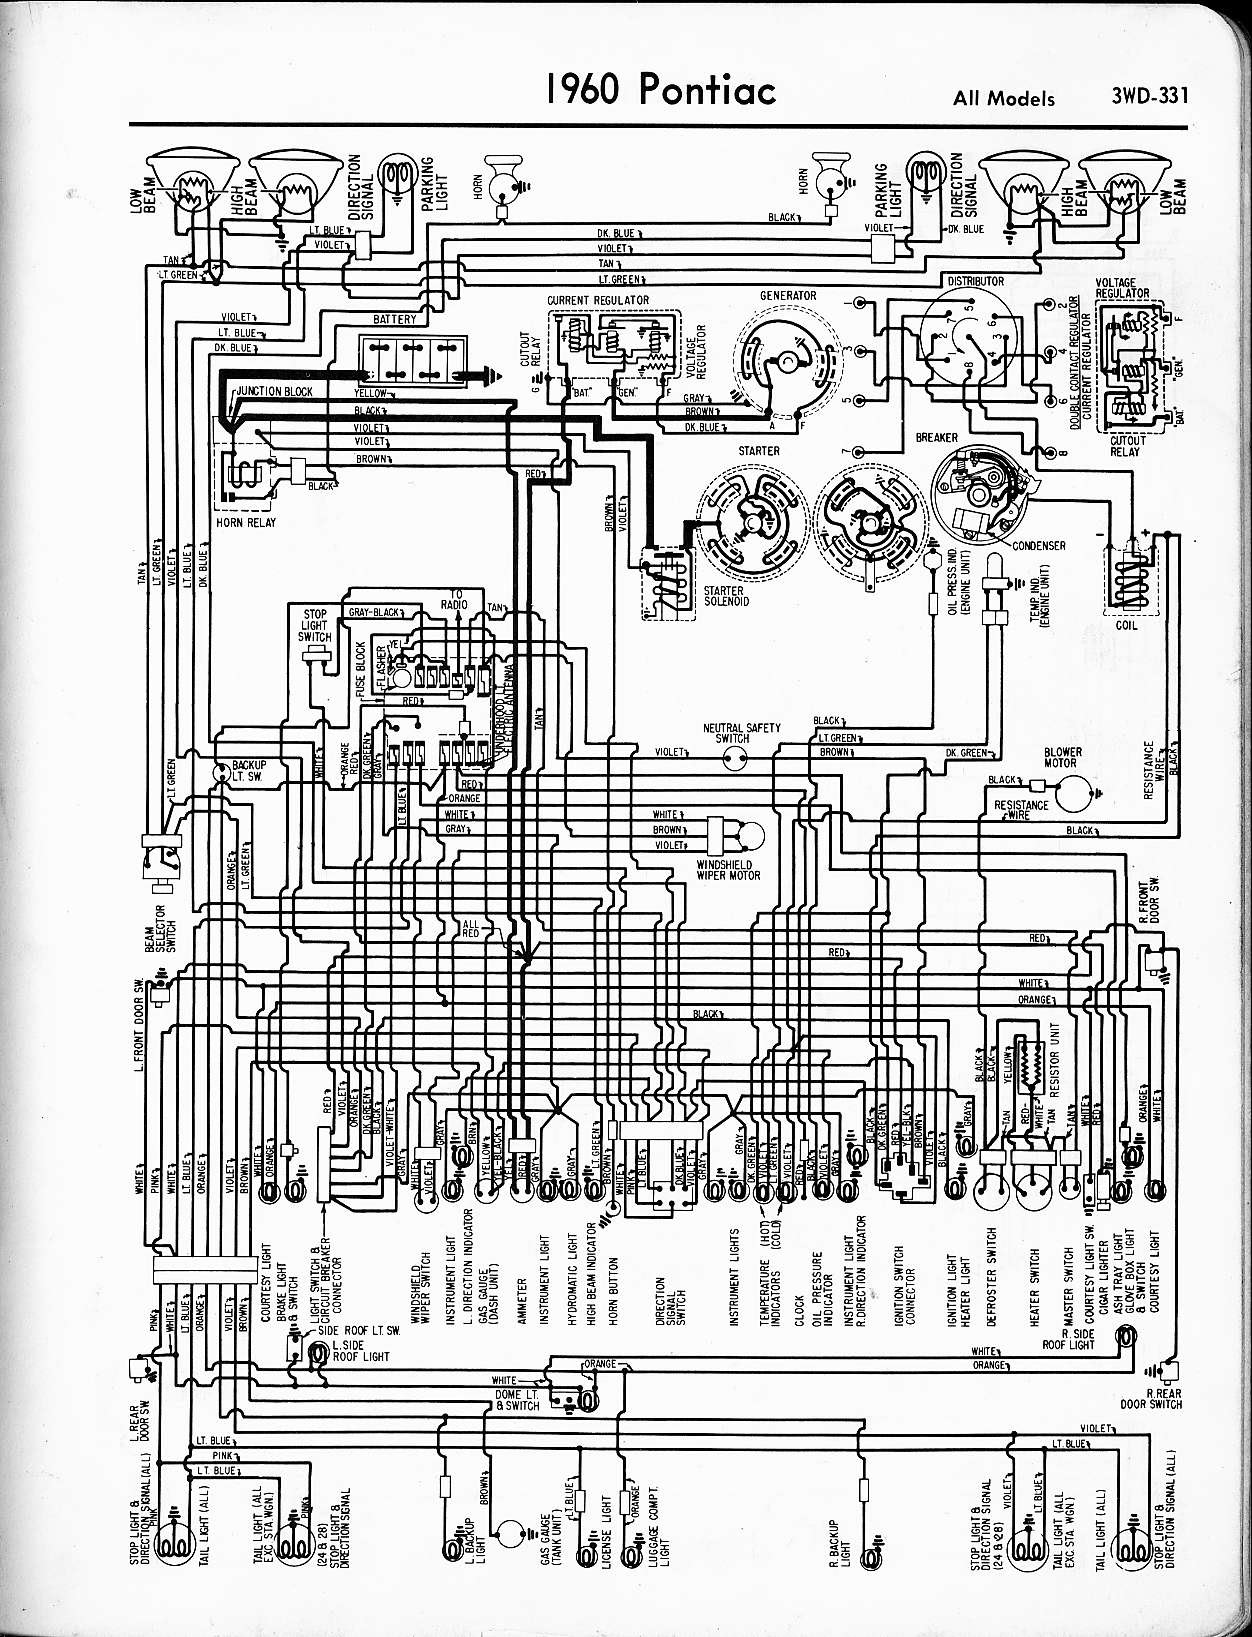 Pontiac Bonneville Alternator Wiring Diagram - Wiring Diagram